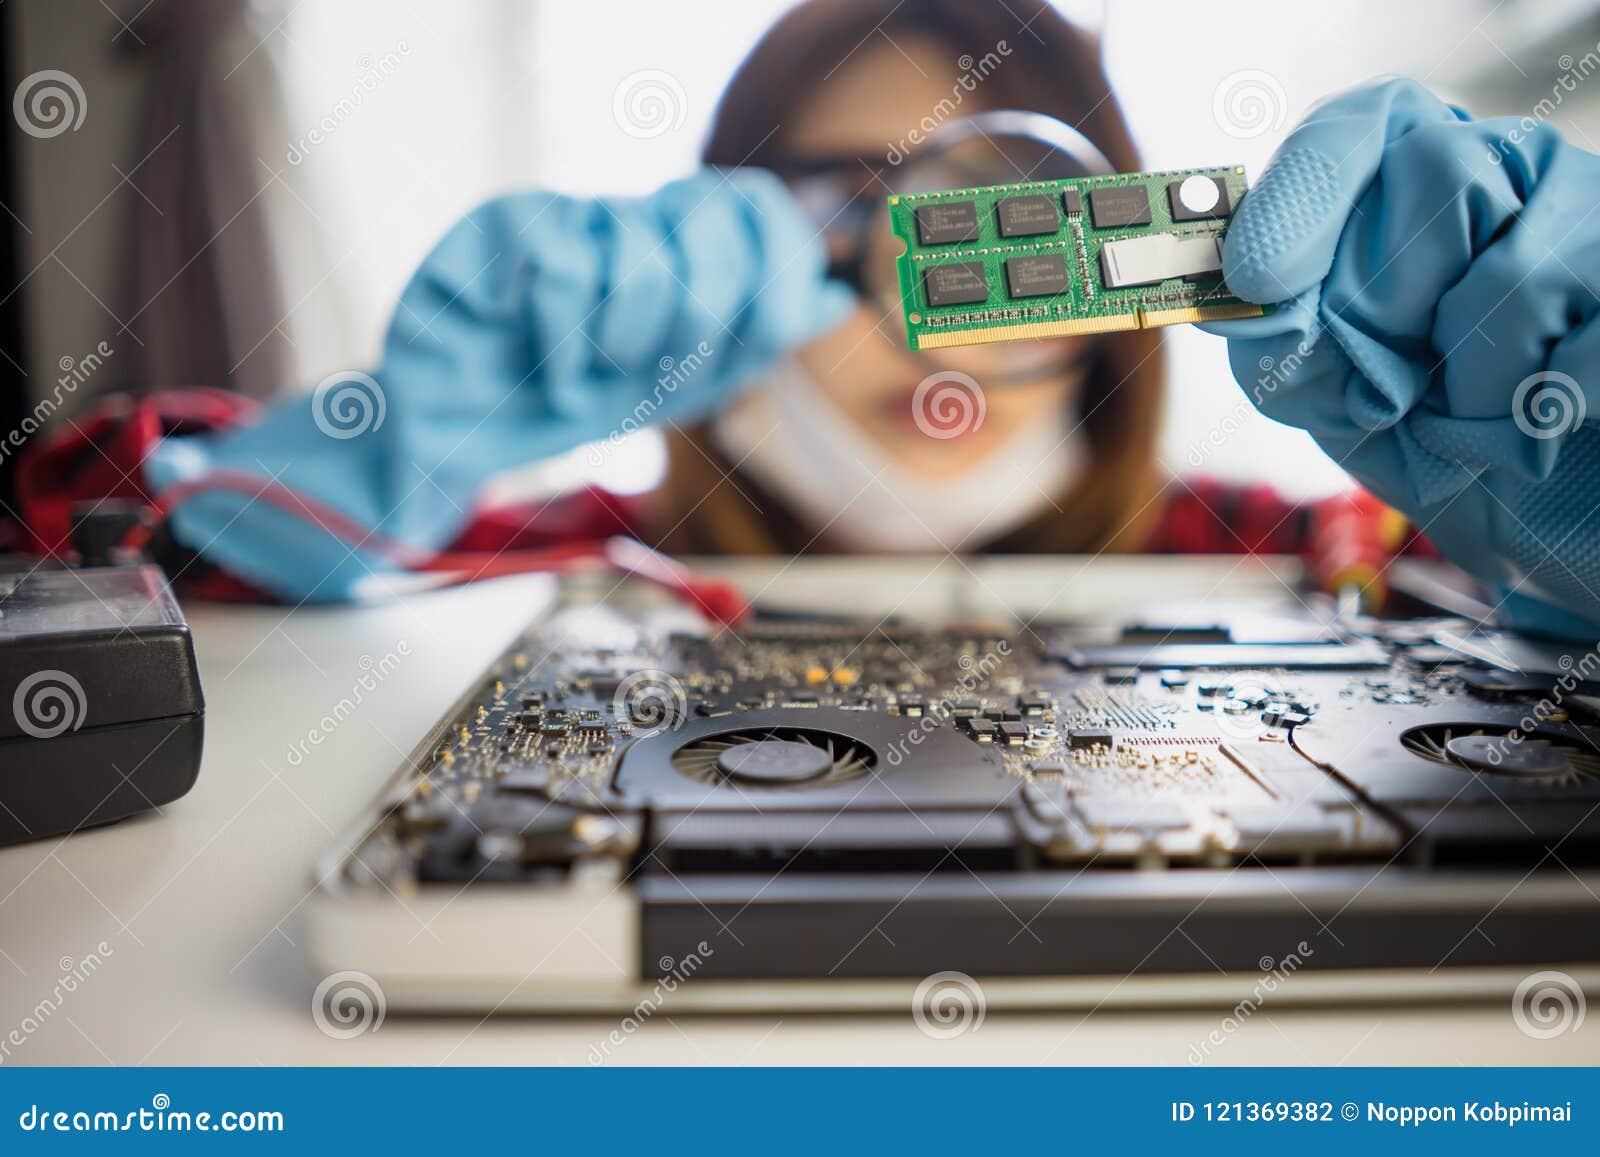 Engineer Repairs Laptop Support Fixing Notebook Computer Stock Repairing Circuit Board Royalty Free Photo Image